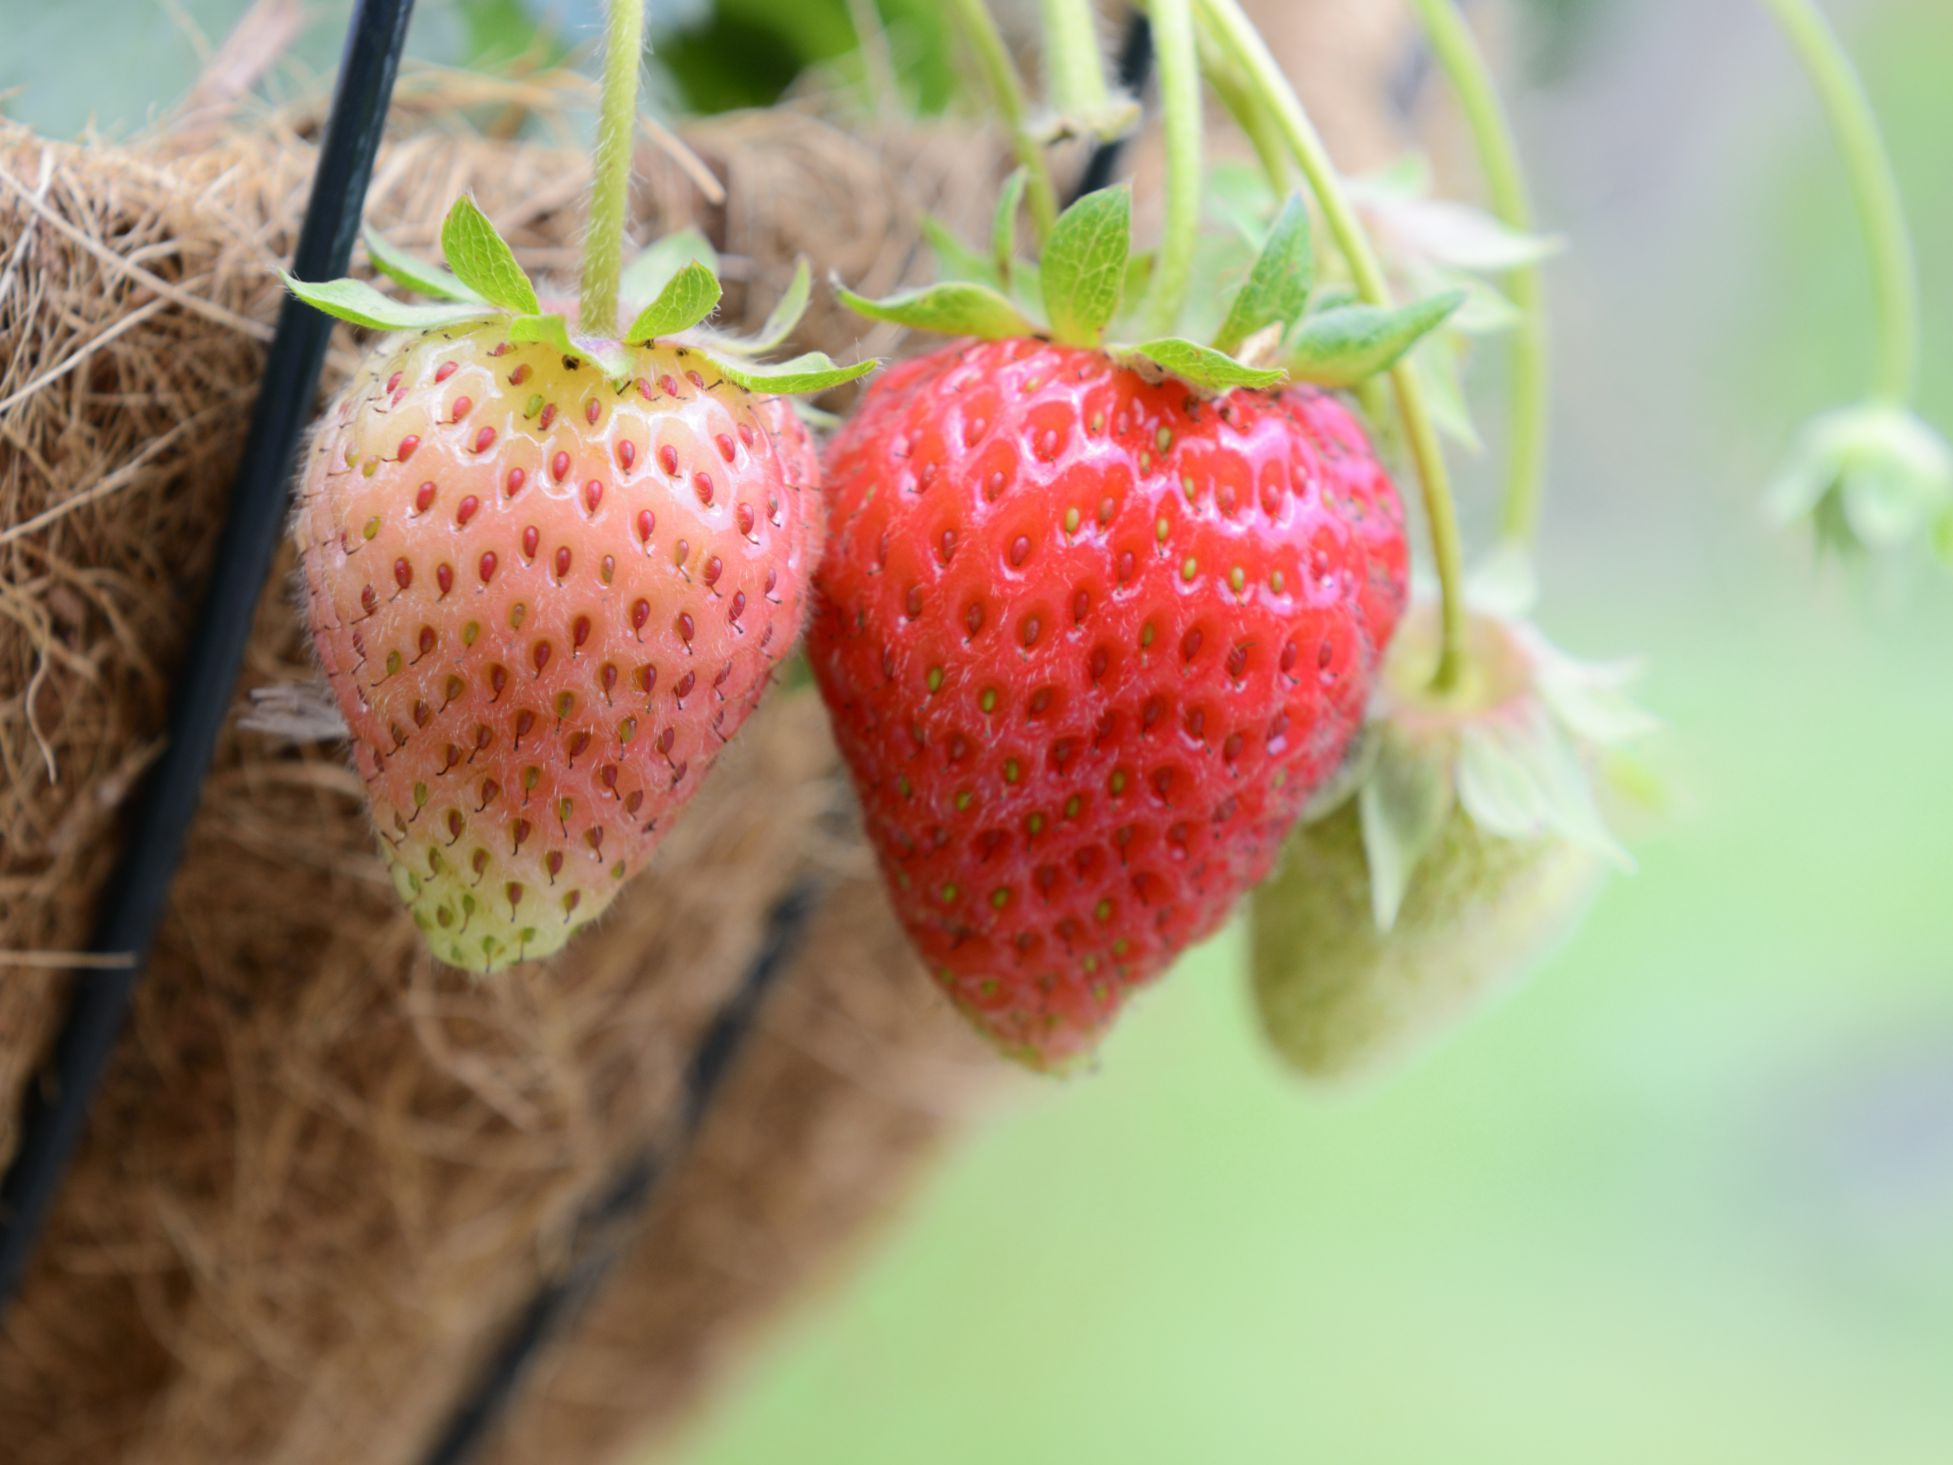 best way to grow strawberries